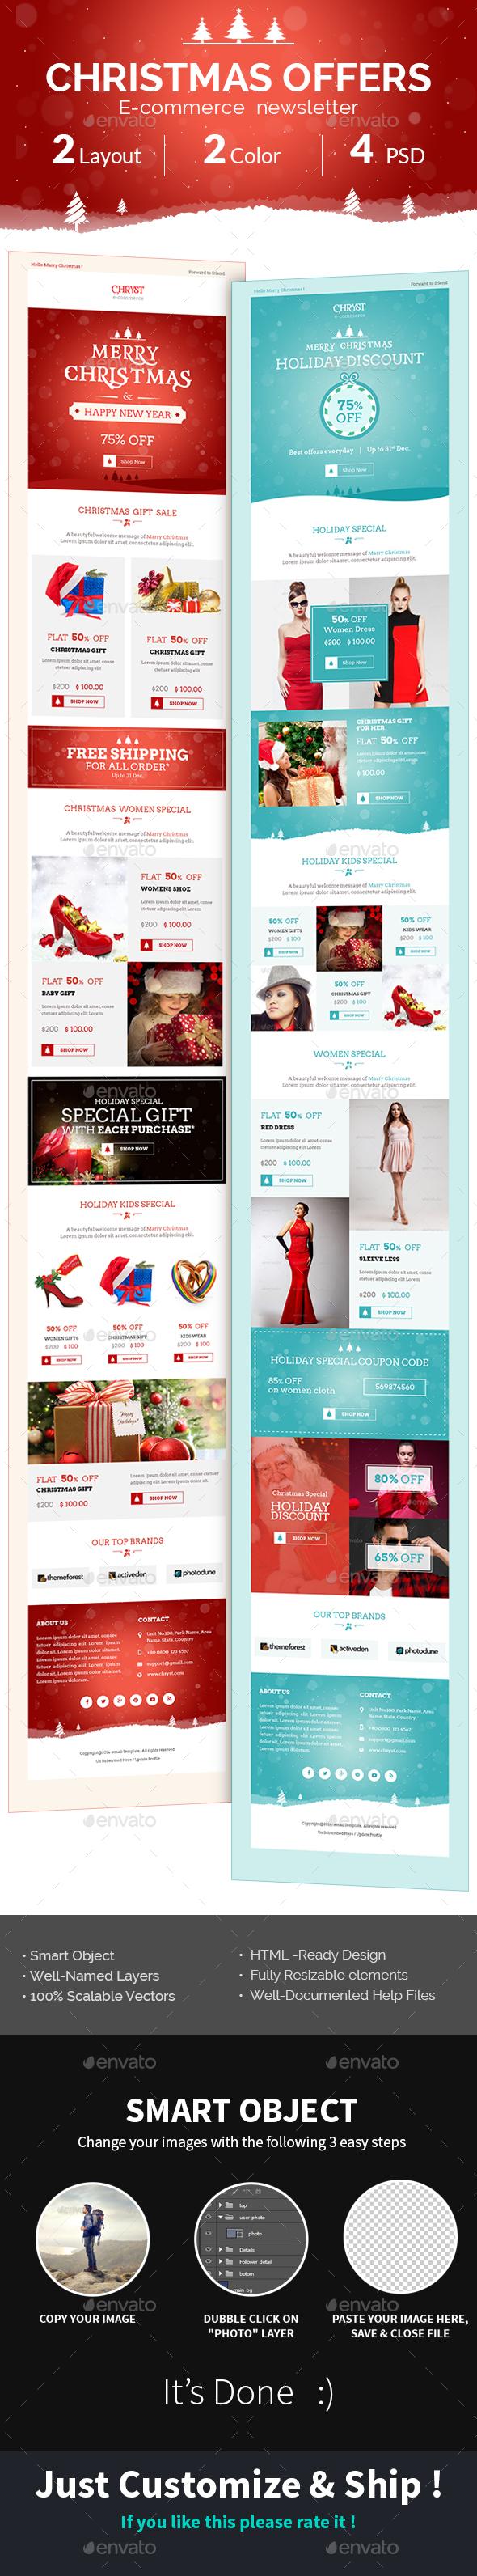 Christmas Shopping Offers | e-Commerce Newsletter - E-newsletters Web Elements